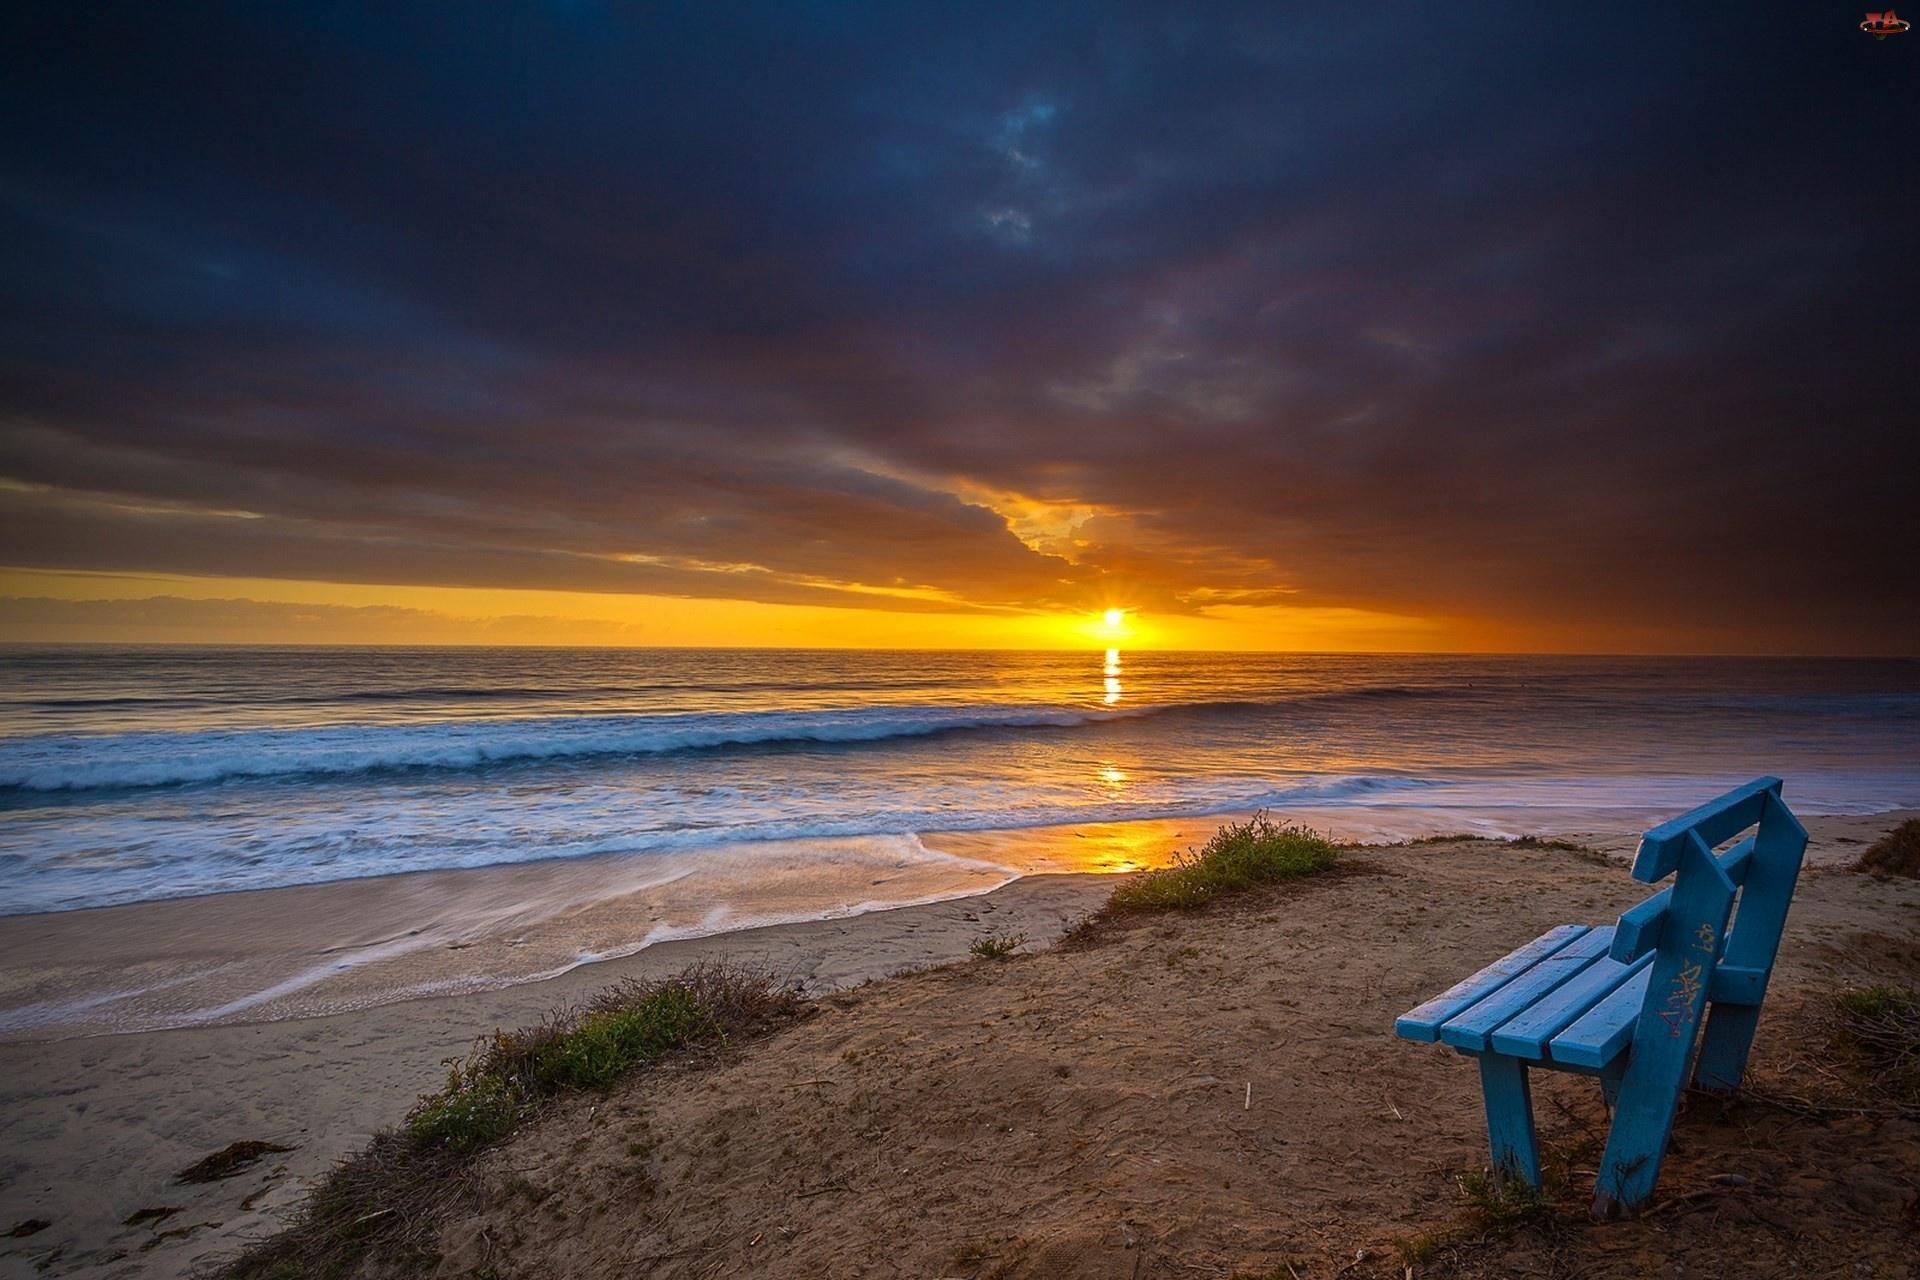 Słońca, Morze, Ławka, Plaża, Zachód